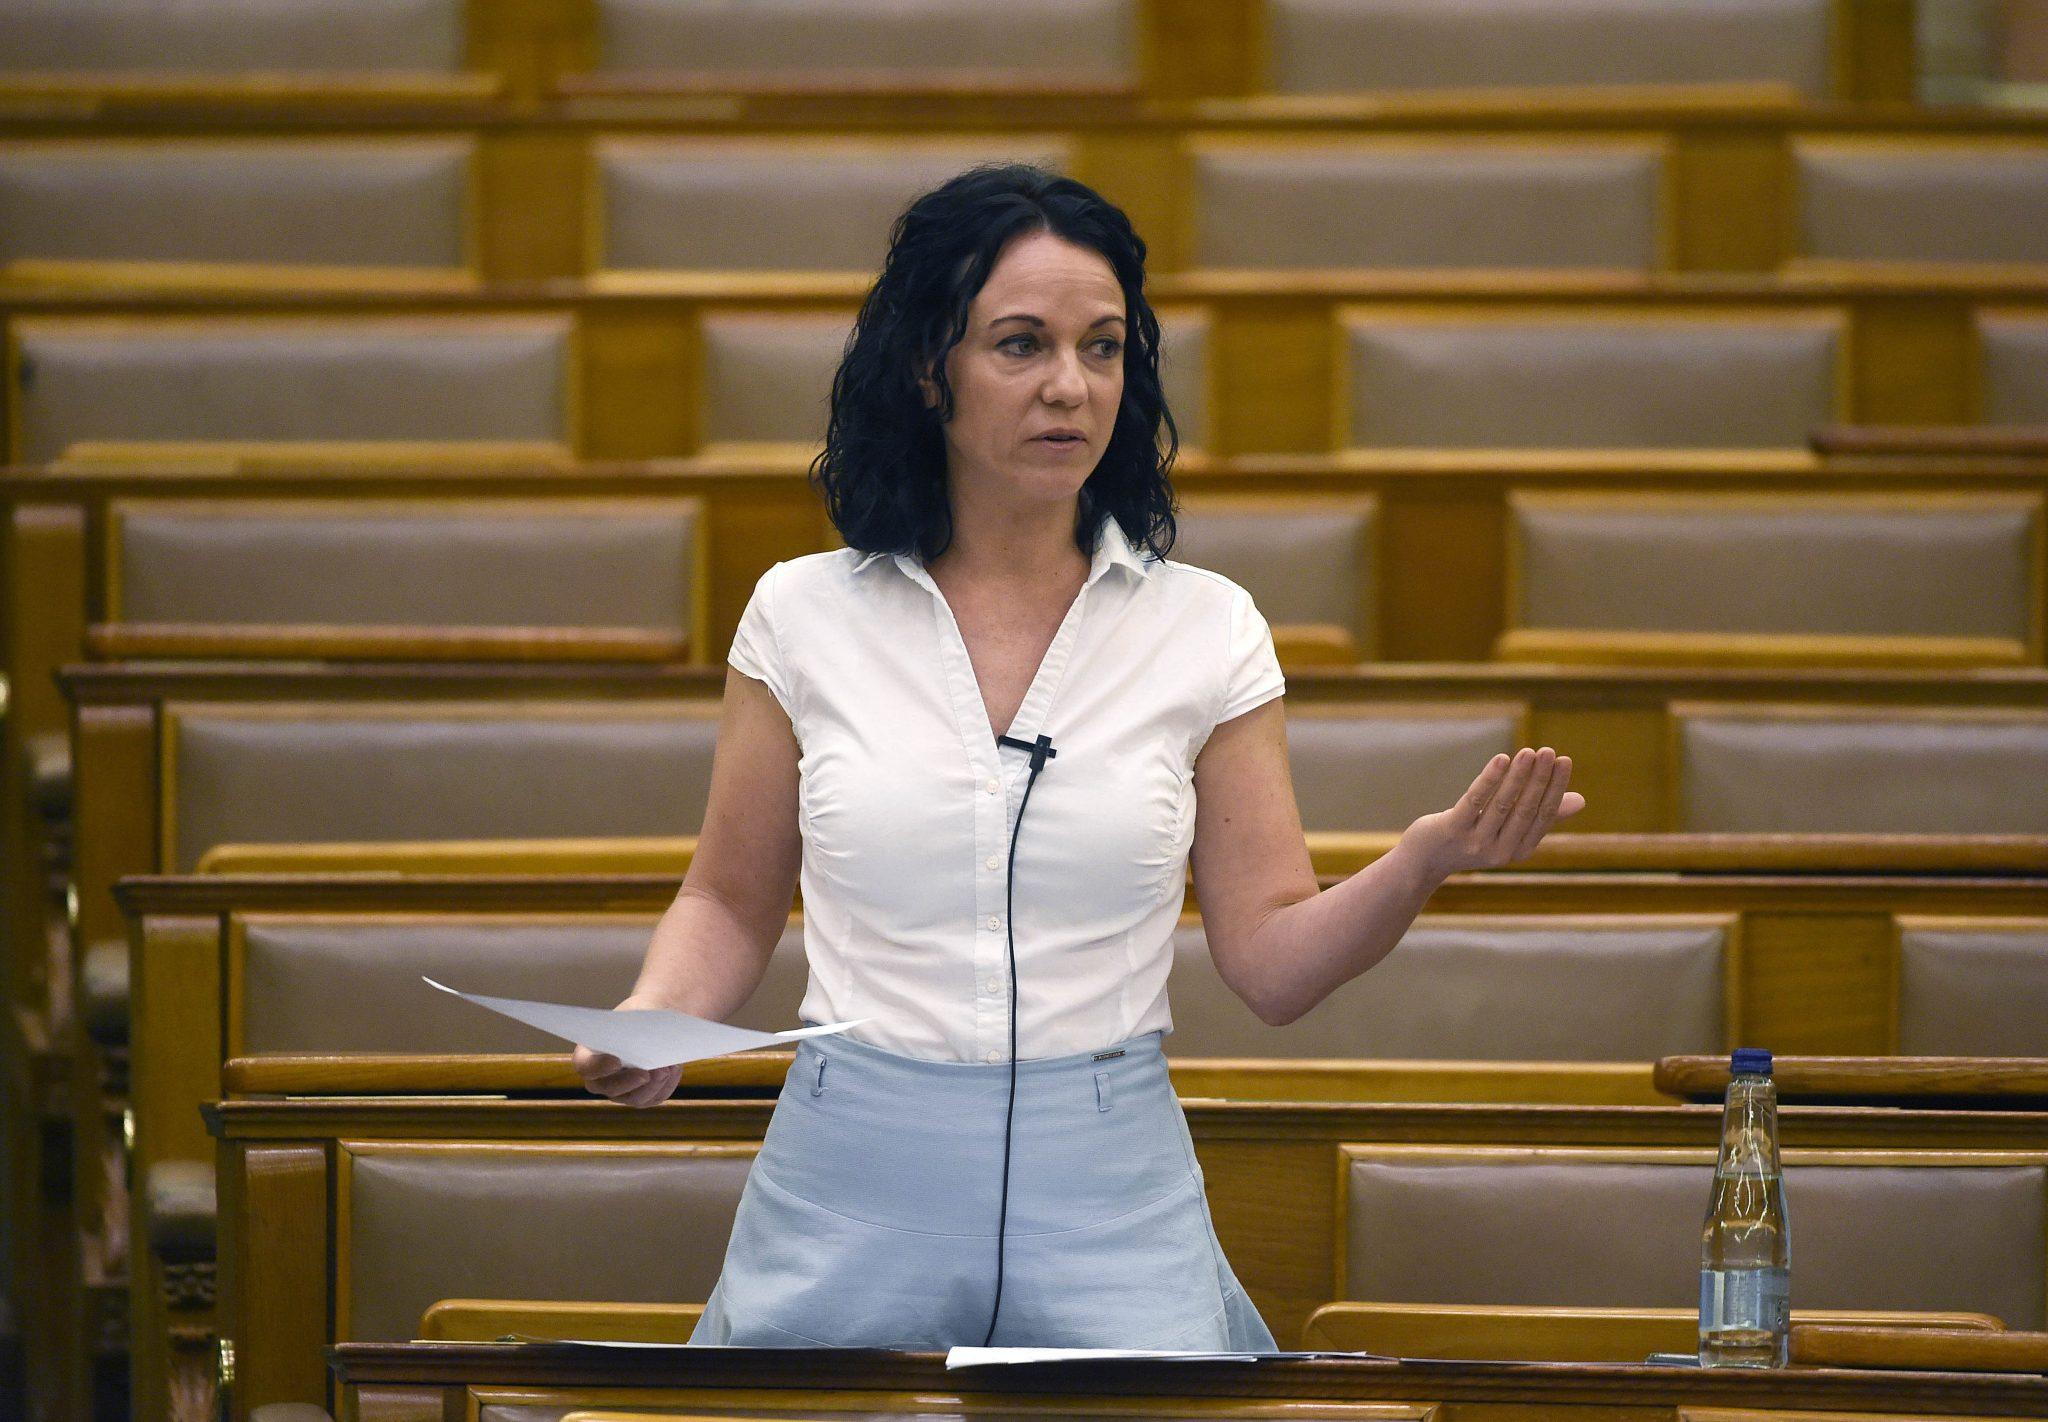 Párbeszéd Proposes Referendum before Potential EU Exit